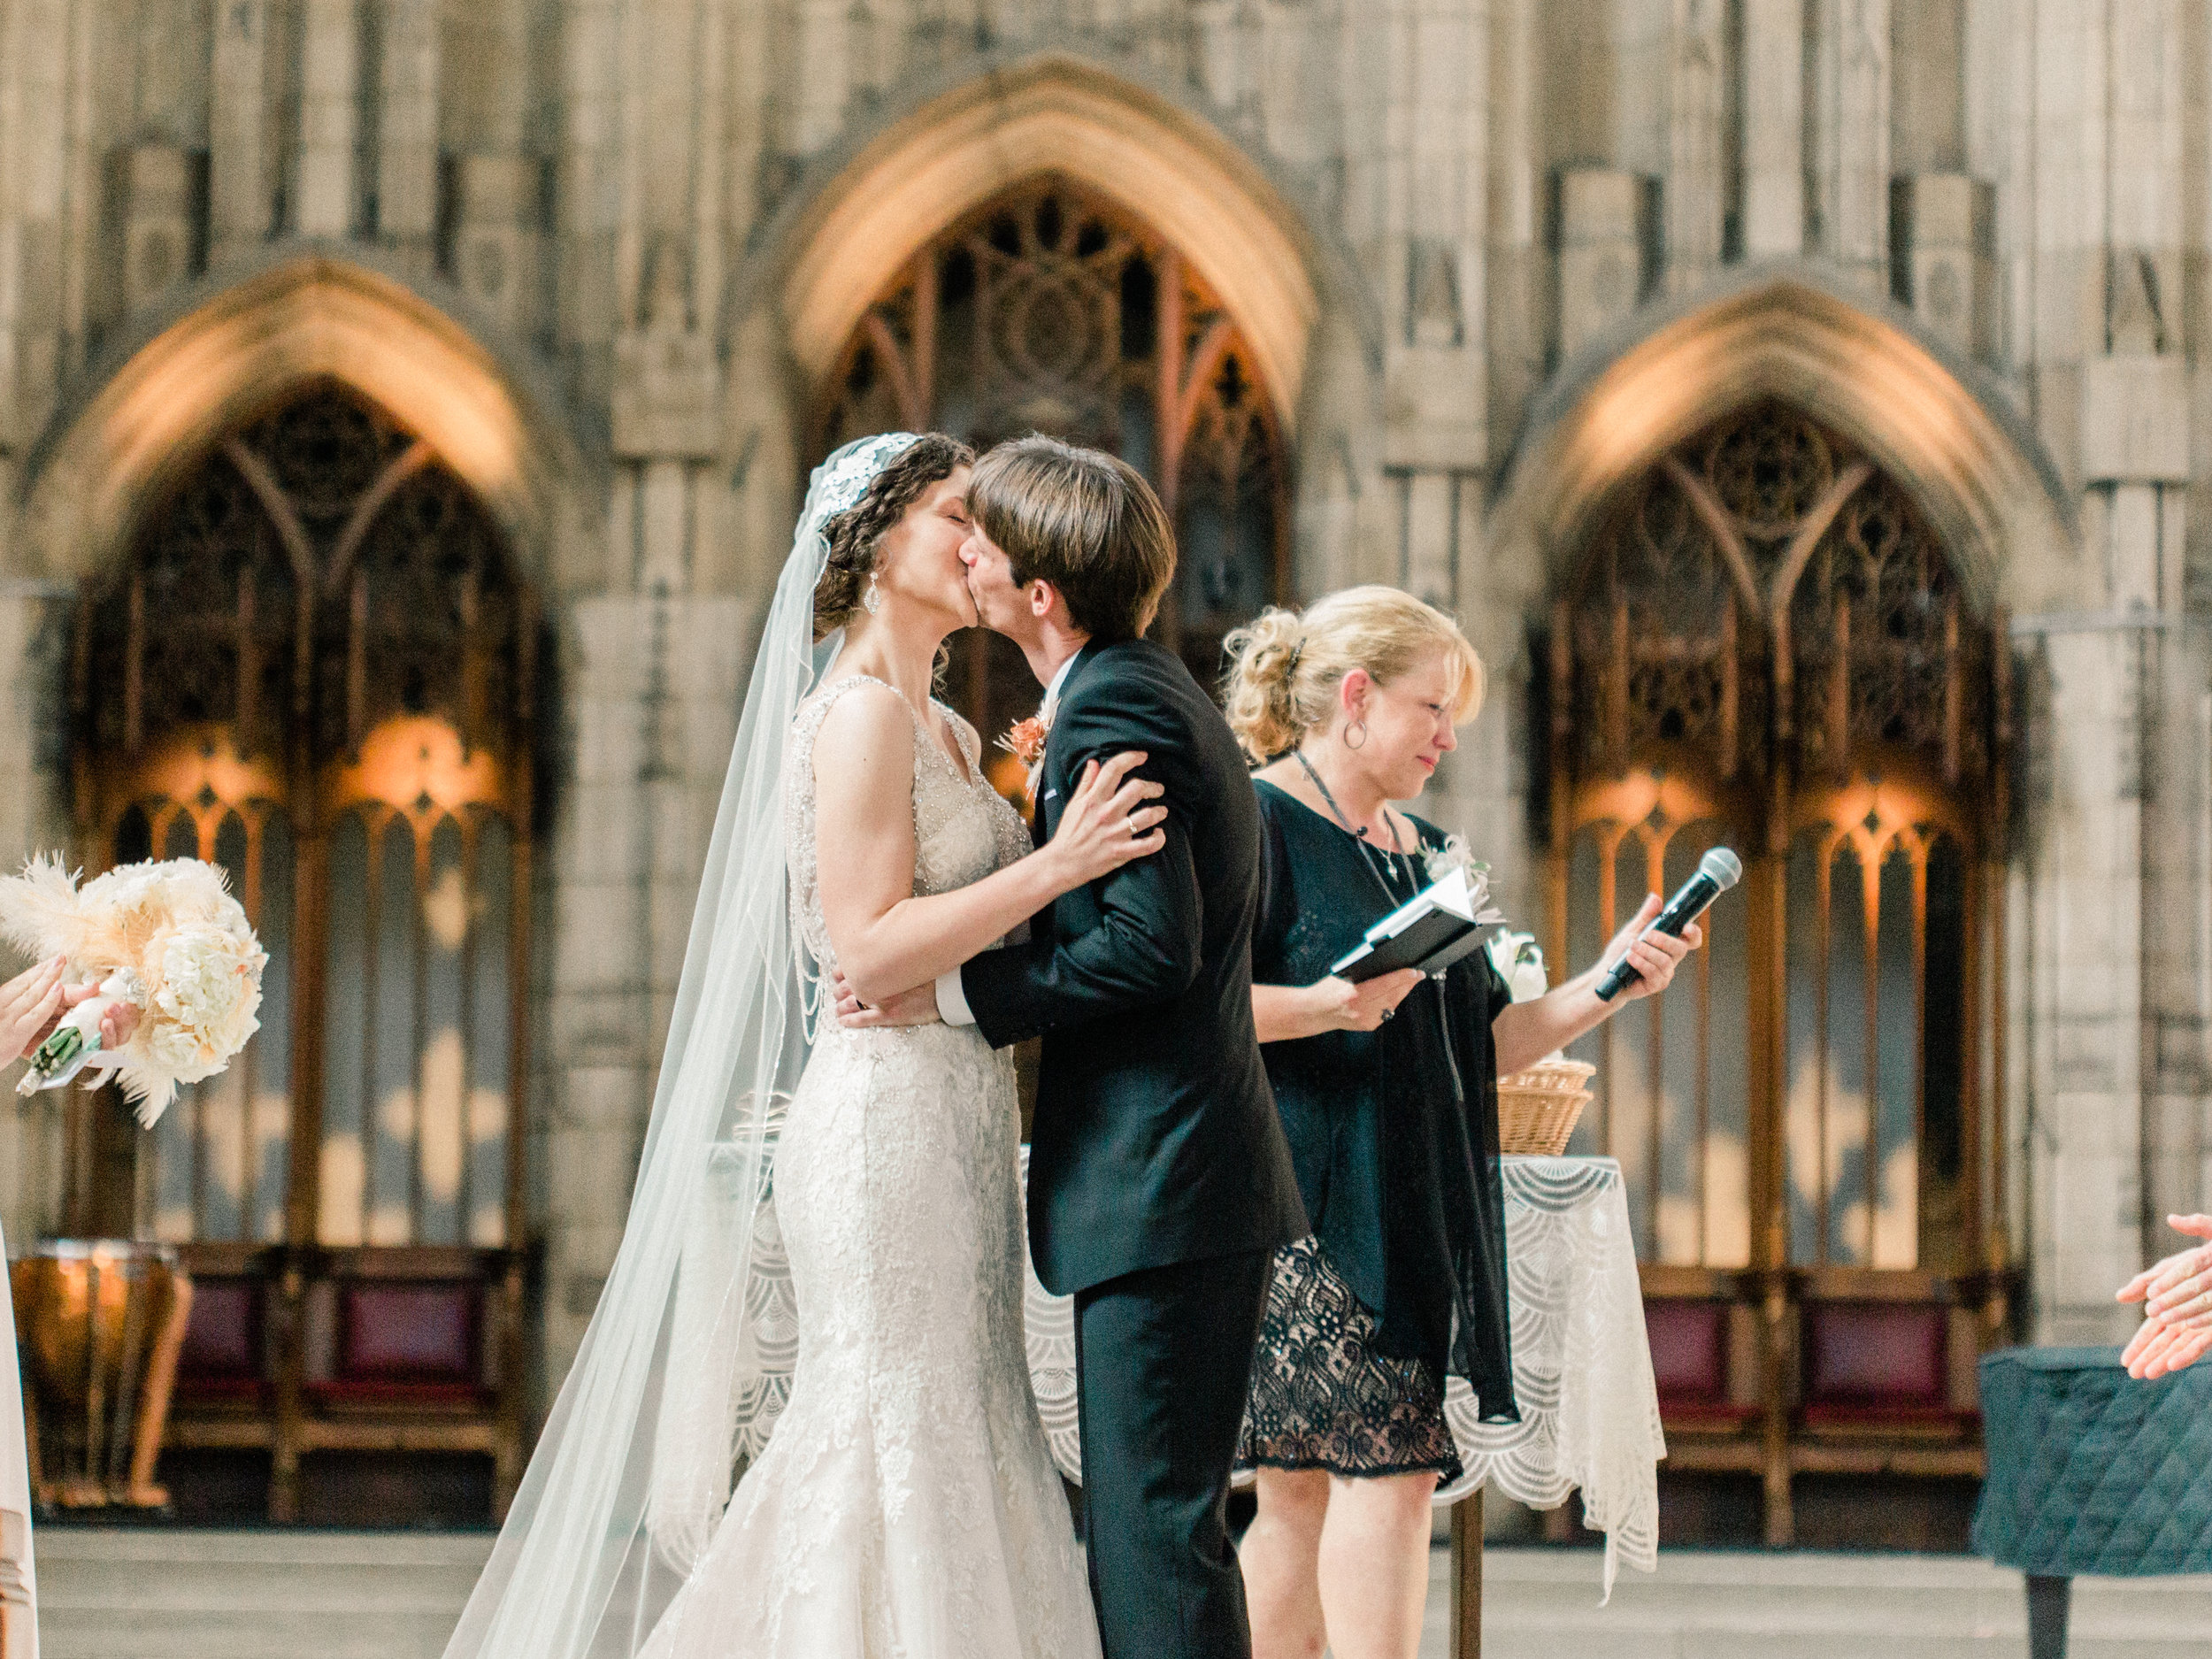 Dorothy_Louise_Photography_University_of_Chicago_Chapel_Wedding-27.jpg